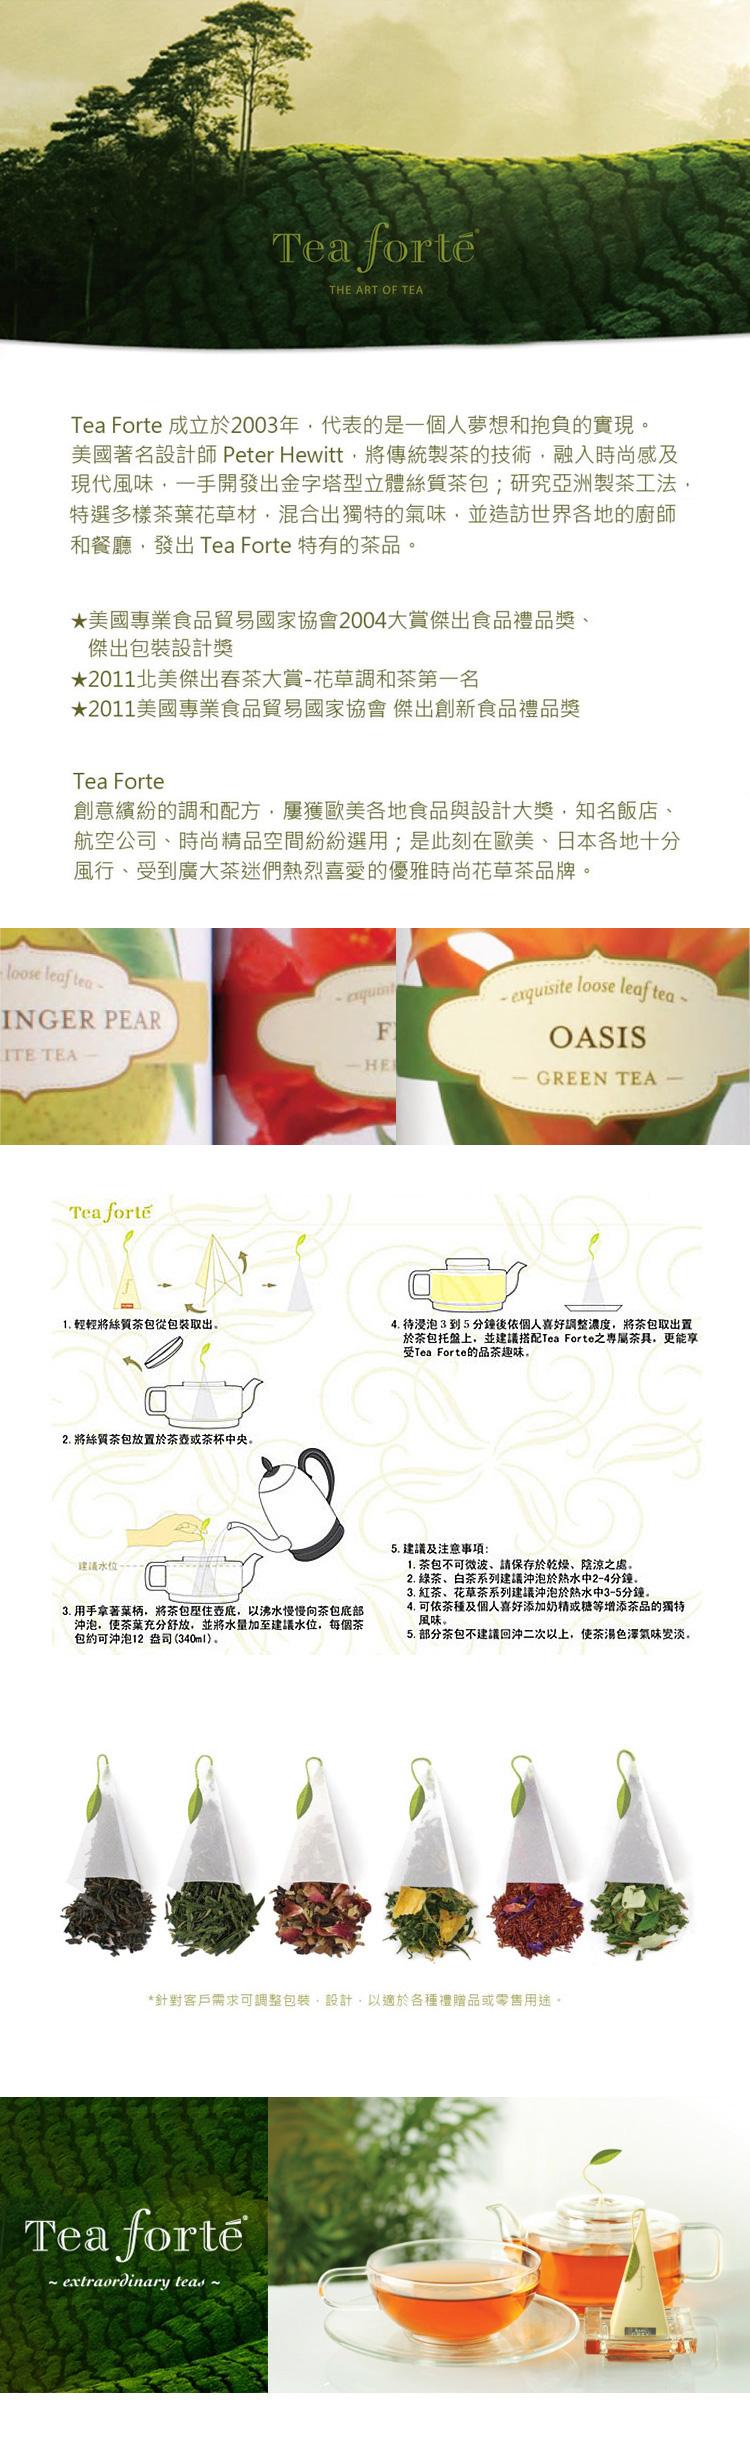 Tea Forte 露思錐形茶葉濾器(白瓷)